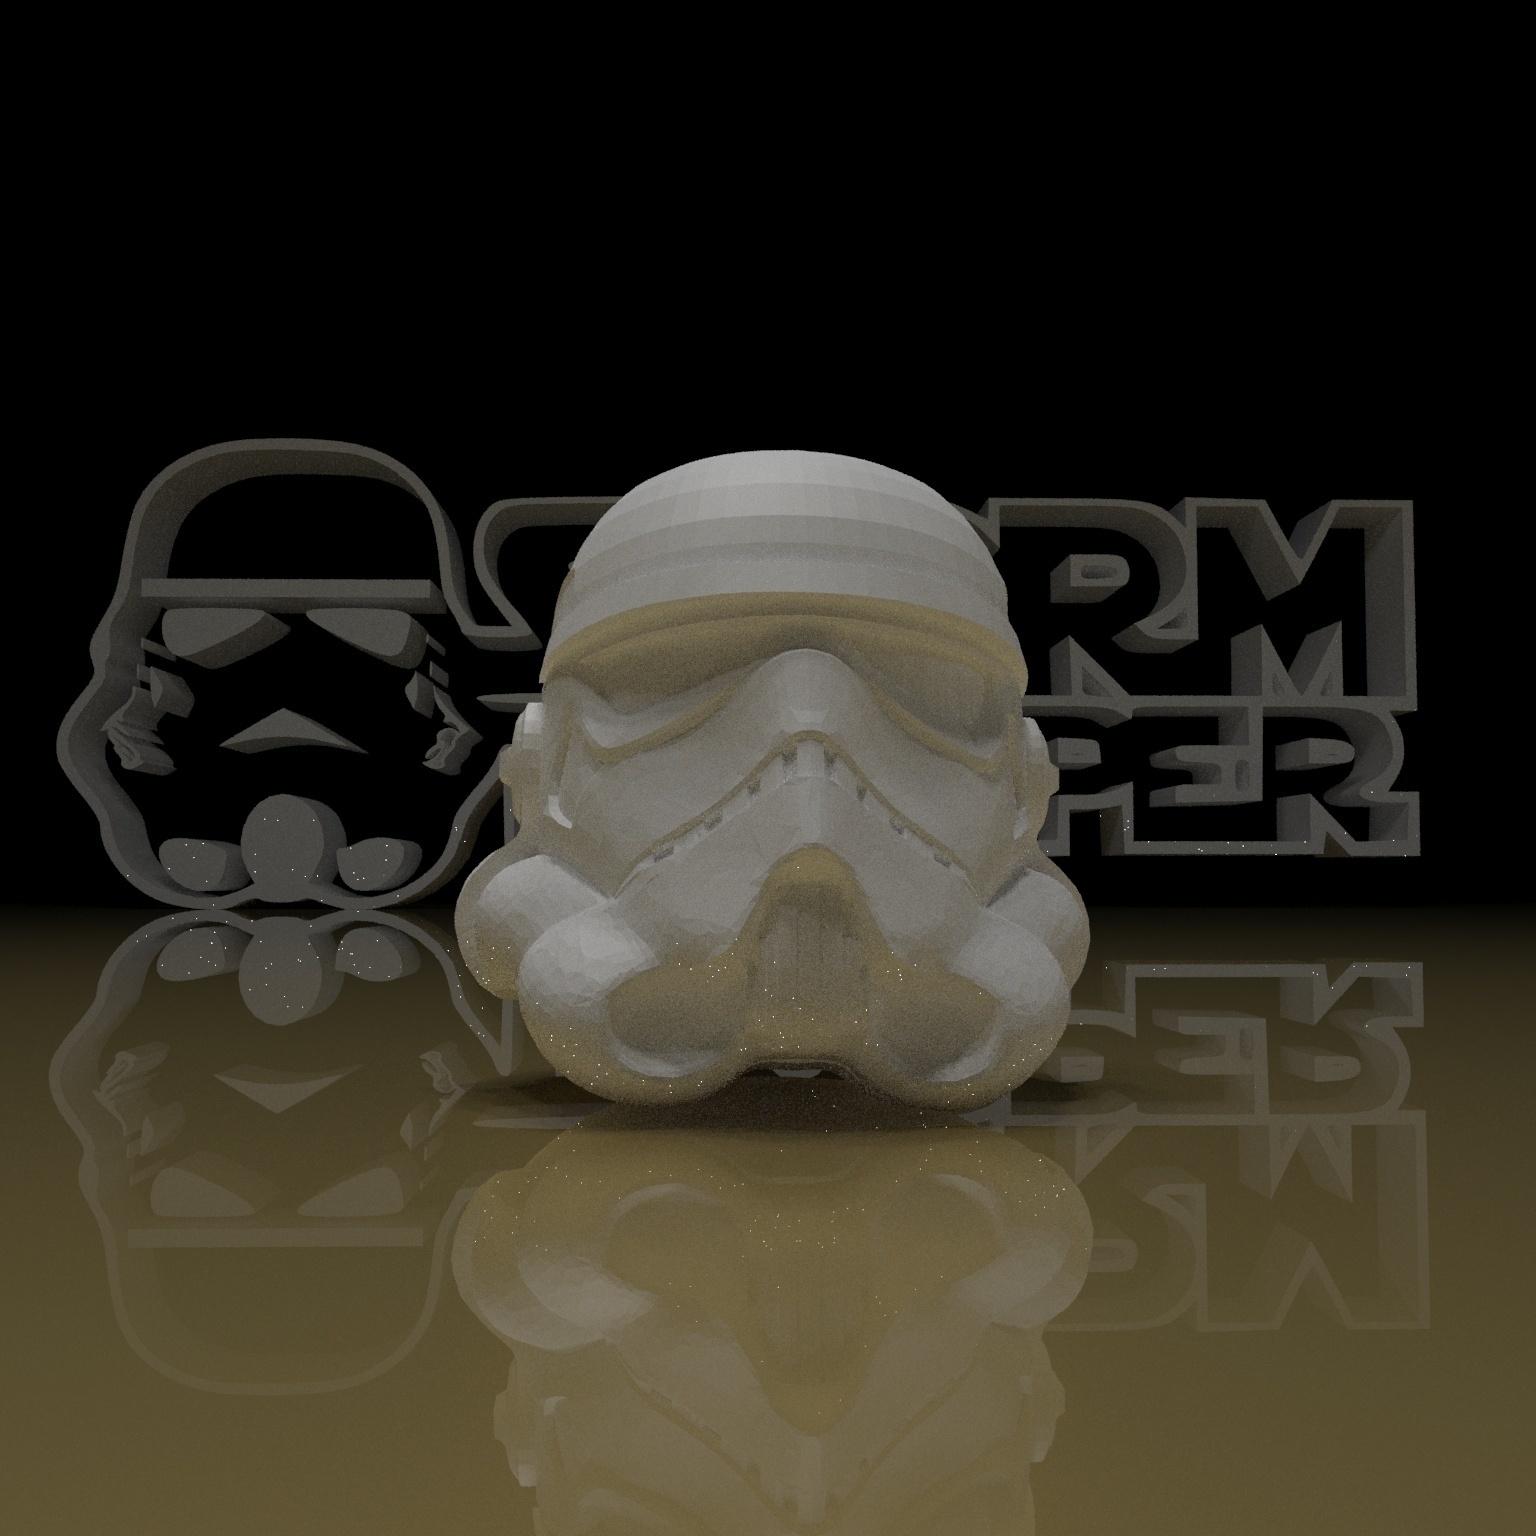 8.jpg Download free STL file STORMTROOPER KEY CHAIN • 3D printing template, paltony22